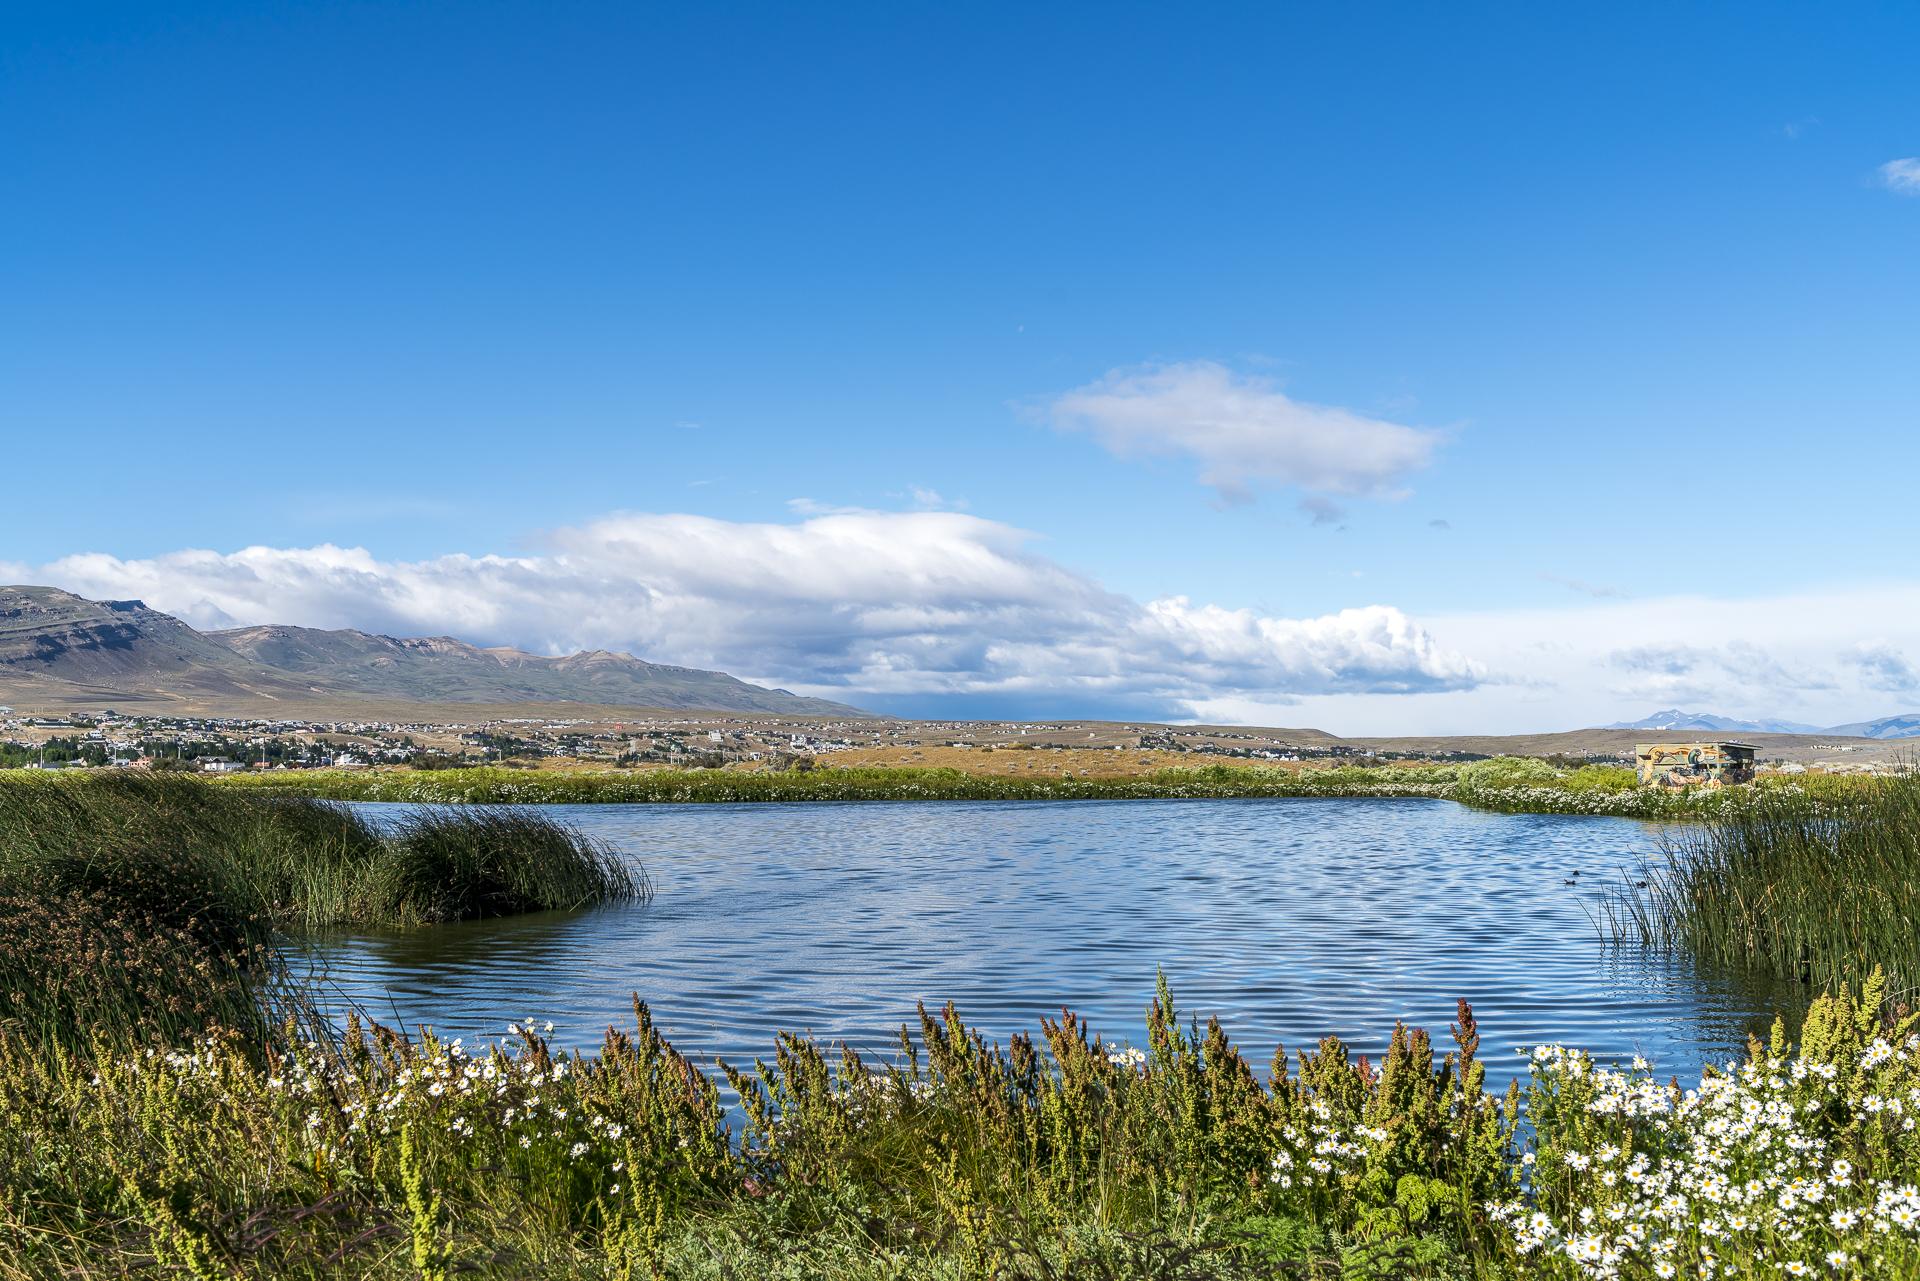 Laguna Nimez Naturreservat El Calafate